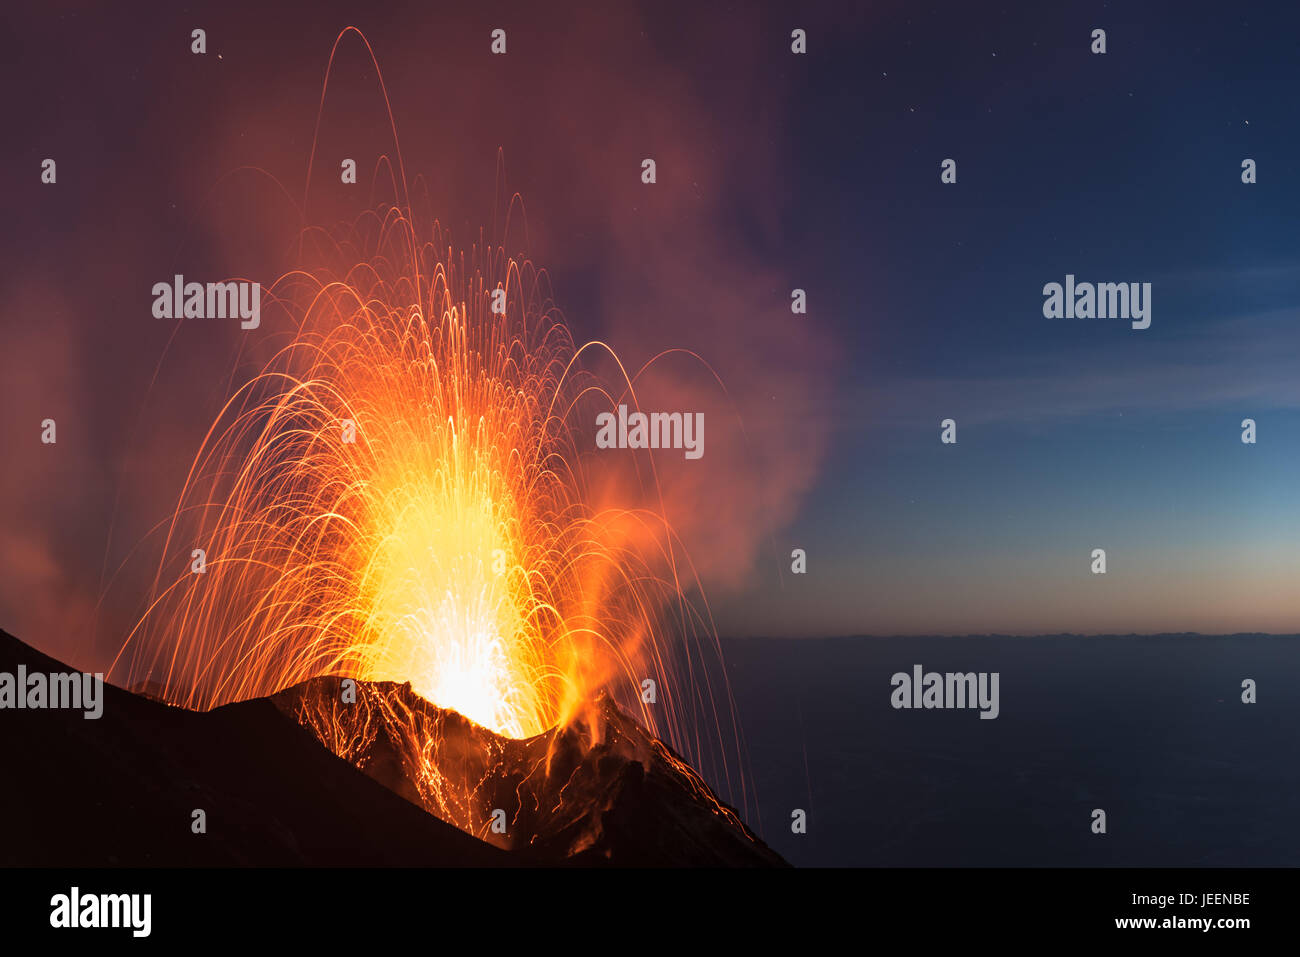 Strong strombolian volcanic eruption from Stromboli volcano (Eolian Islands, Lipari, Italy) at night, craters illuminated - Stock Image